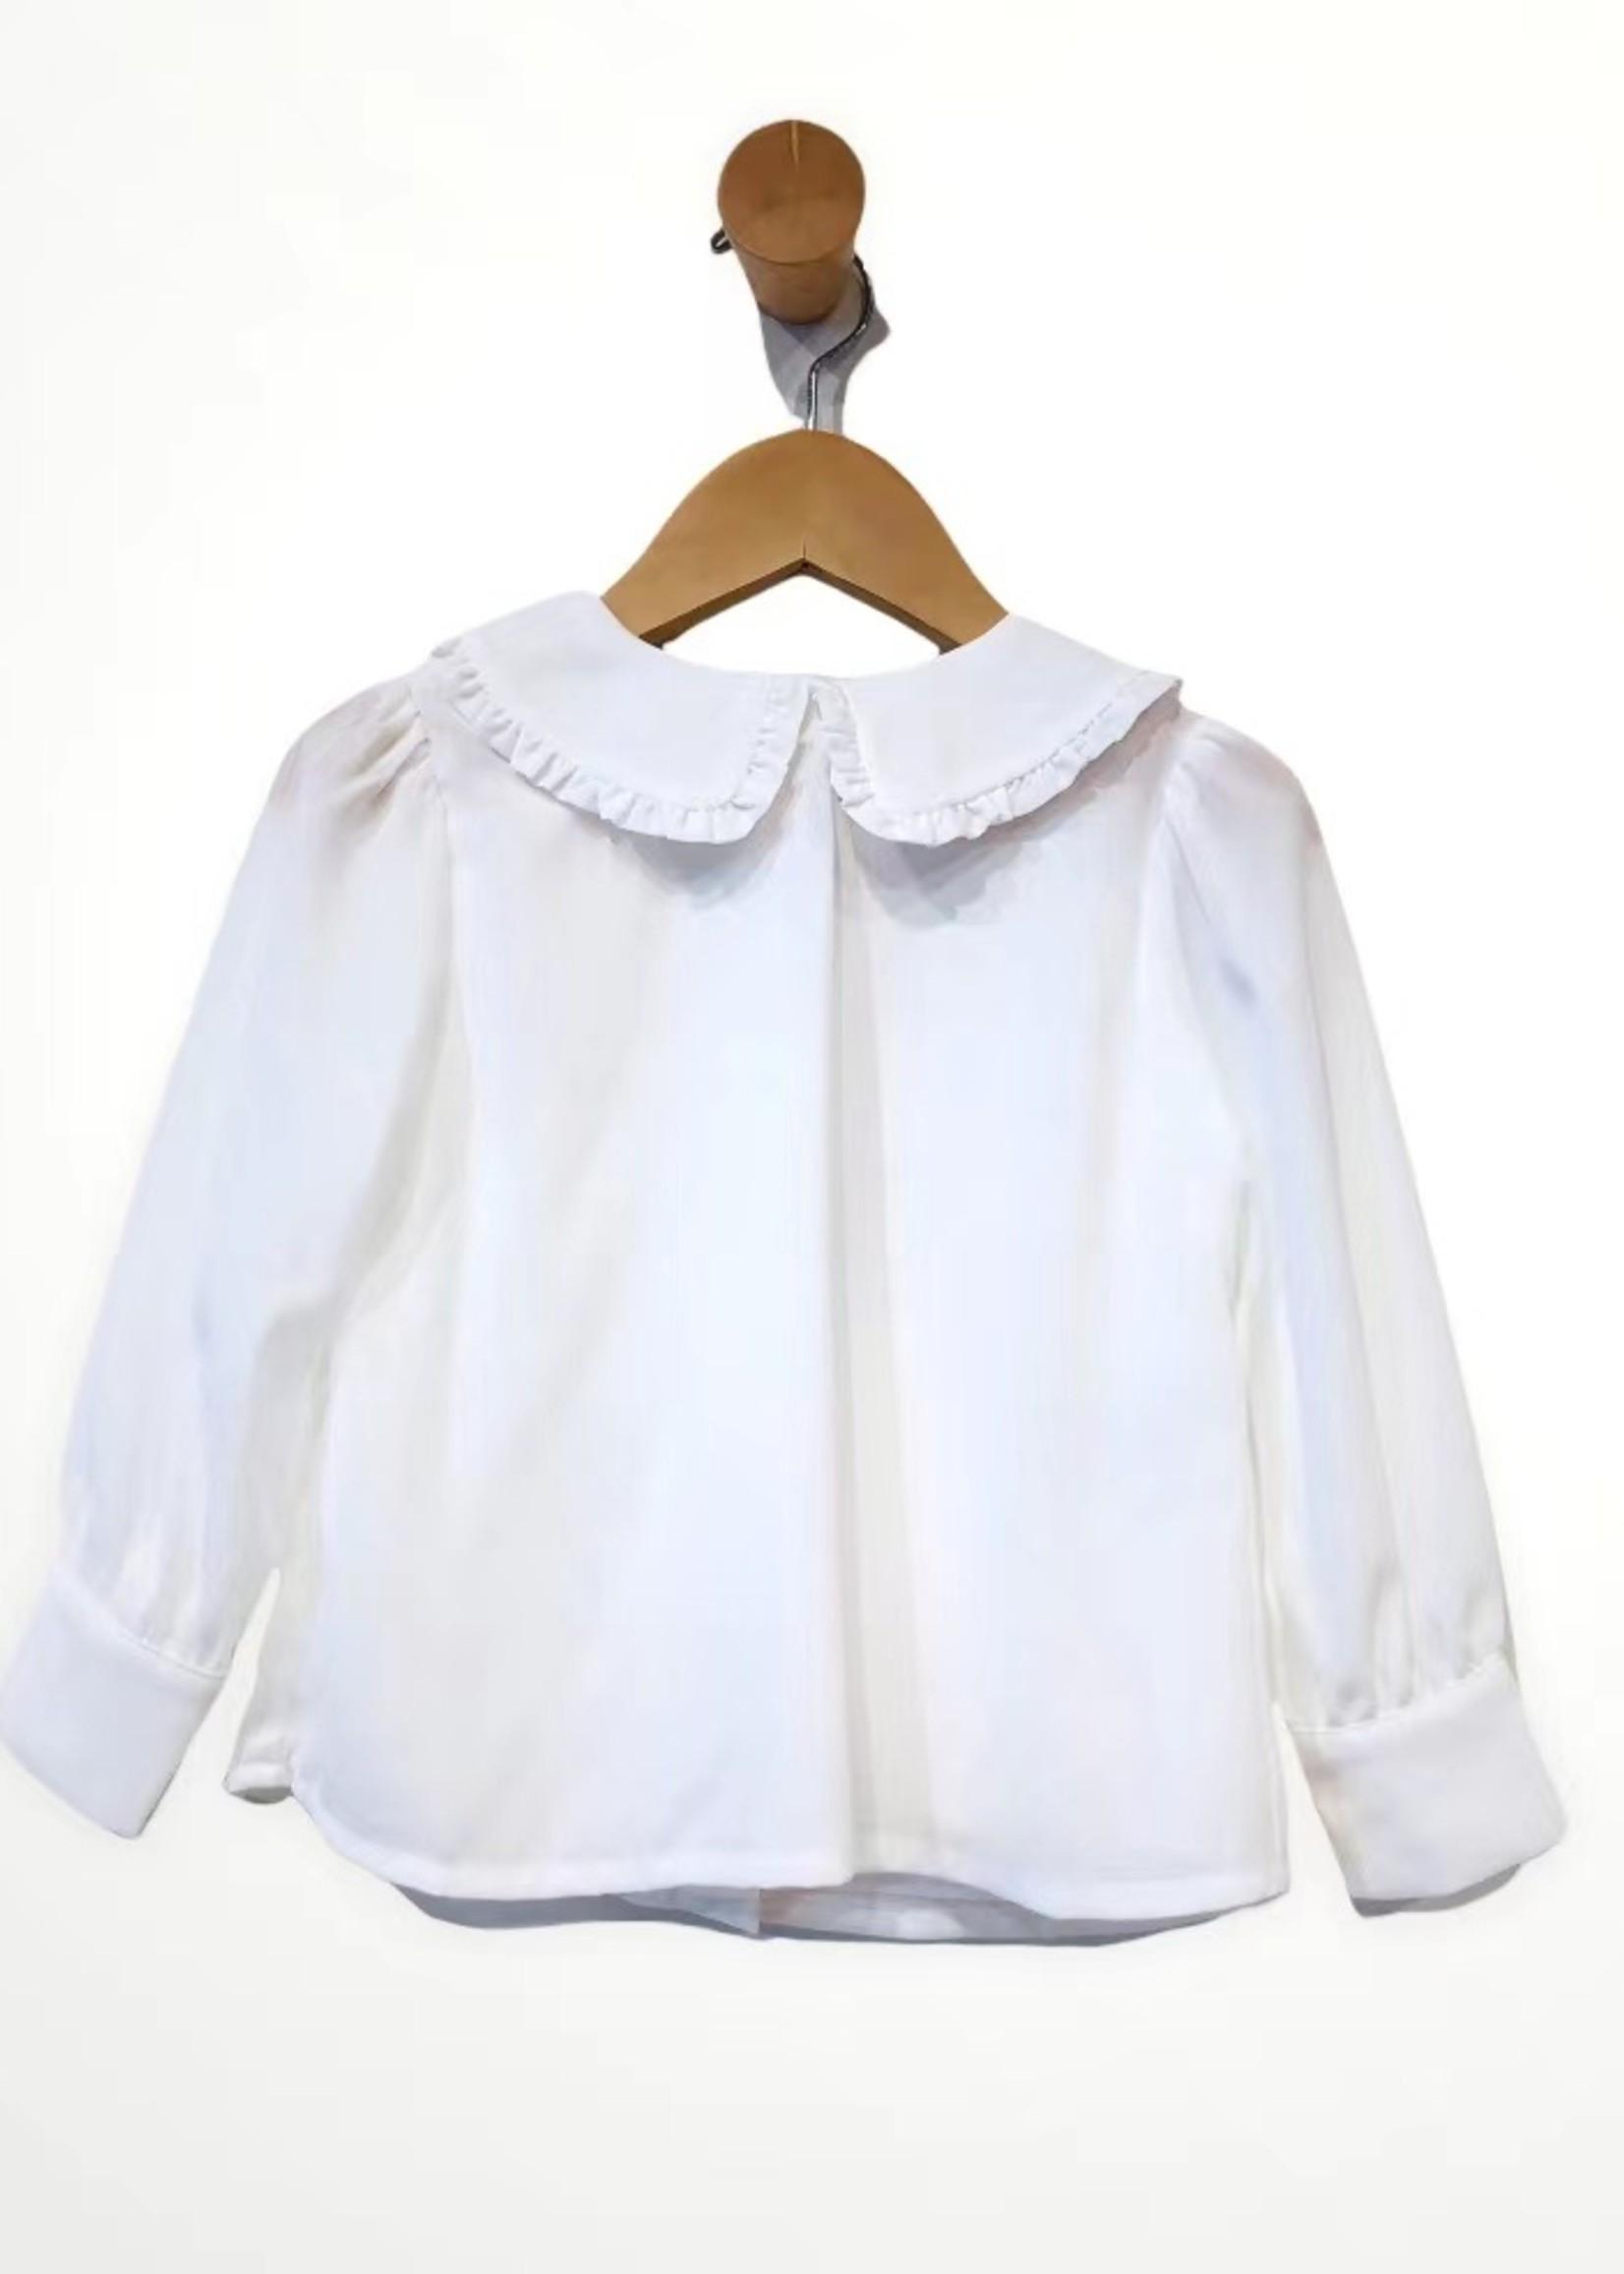 Patachou Patachou-AW21 3333441 blouse